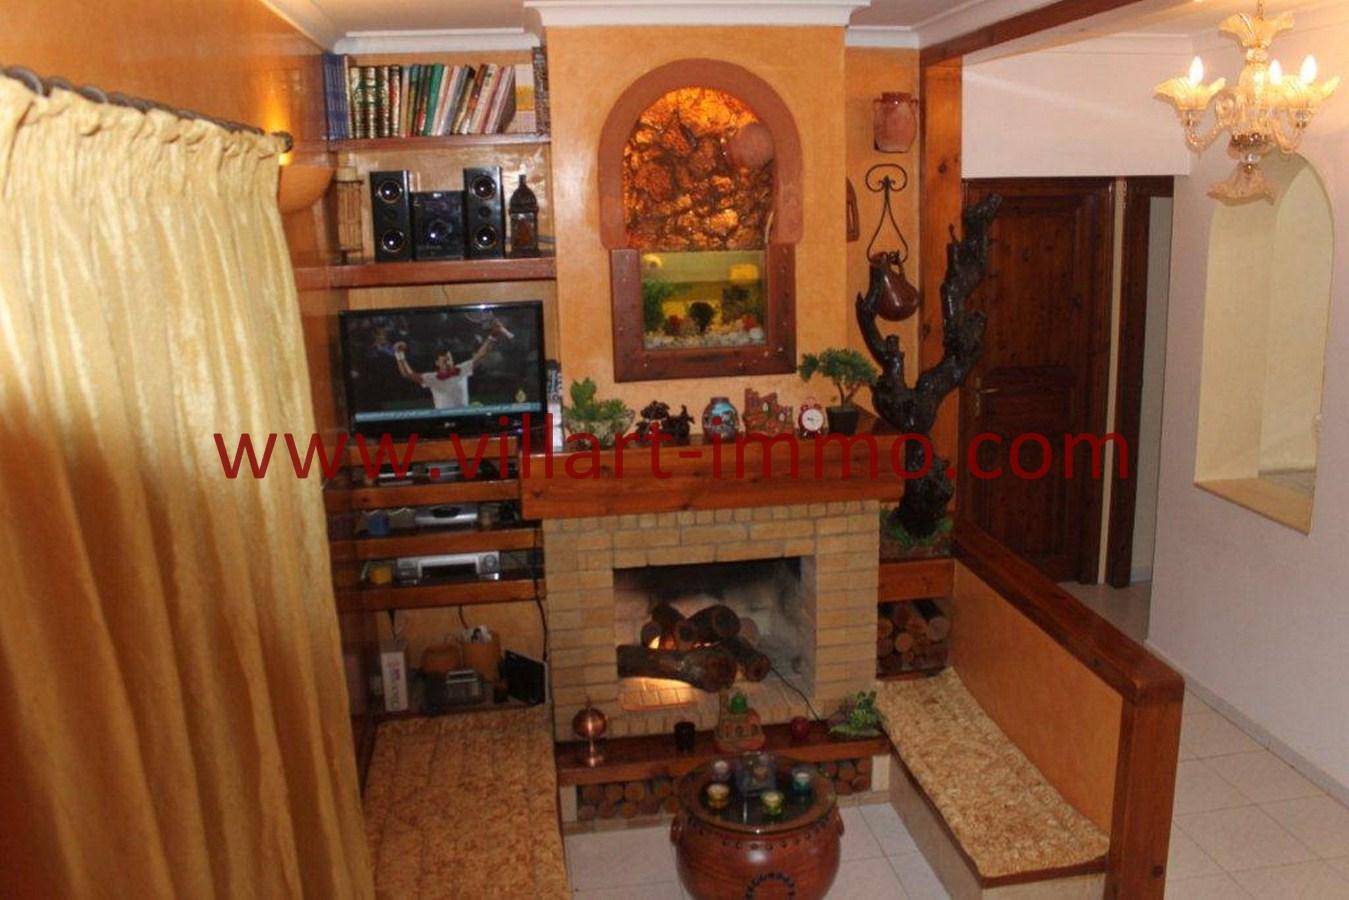 3-Vente-Appartement-Tanger-Dradab-Salon 3-VA549-Villart Immo